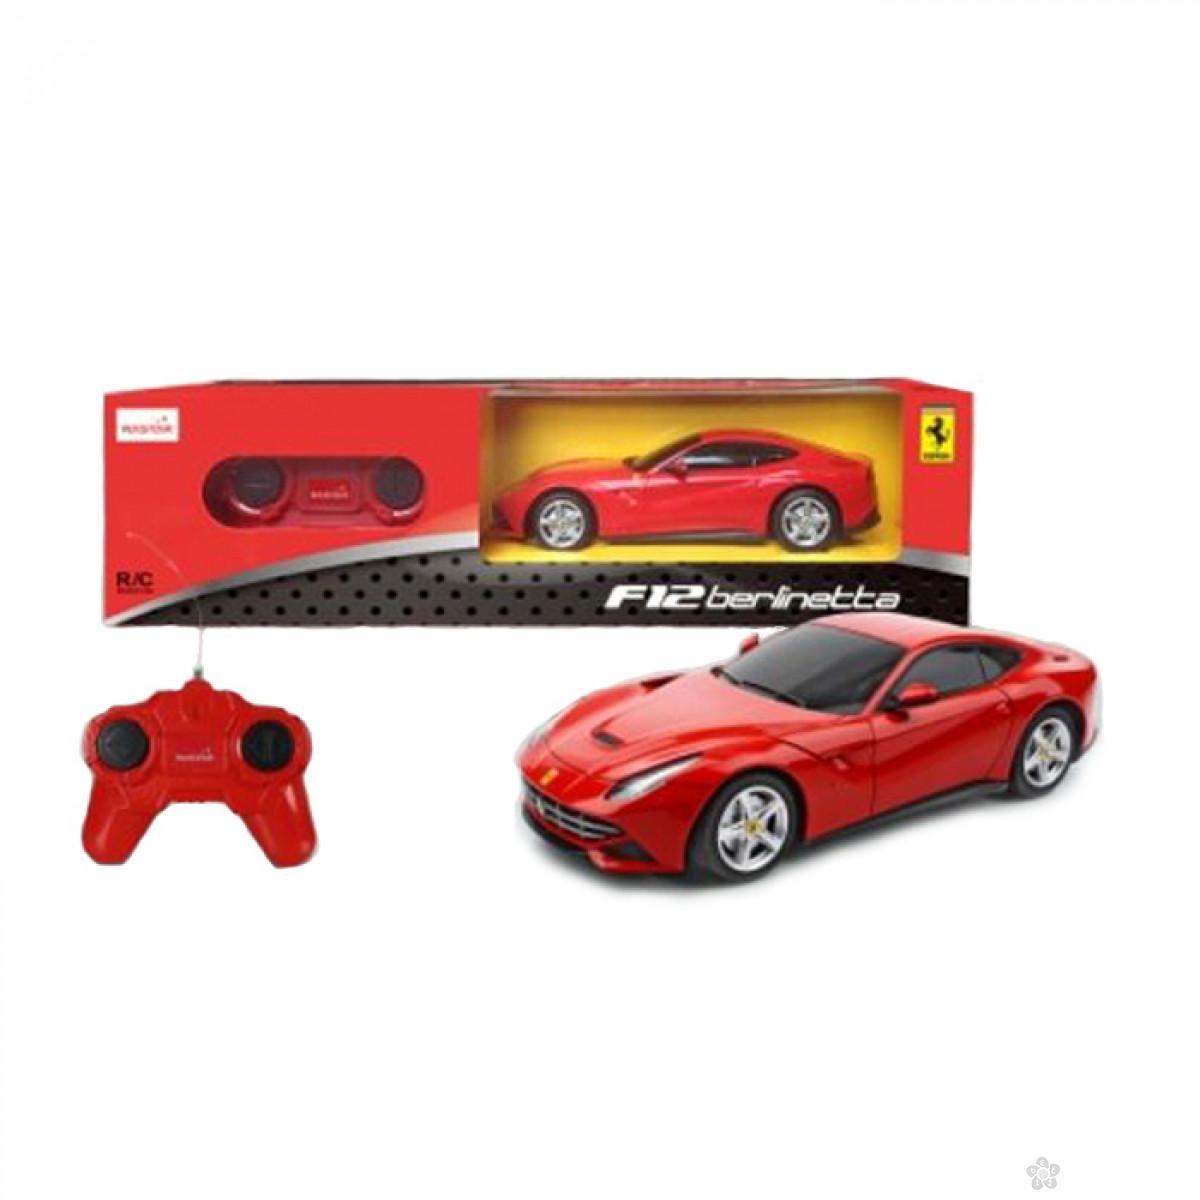 Rastar R/C Ferrari Berlinetta, R48100